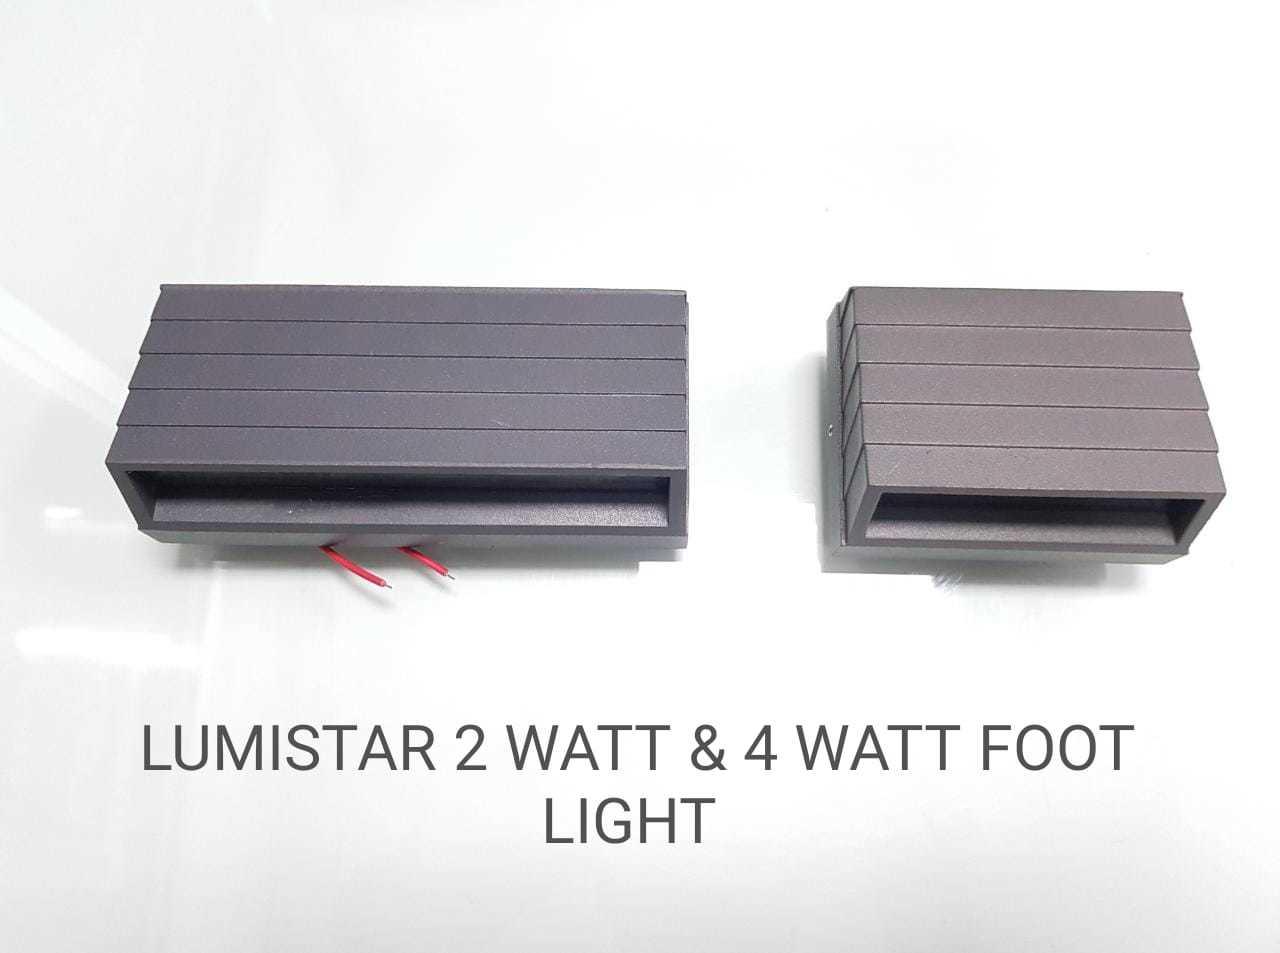 LED FOOT LIGHT